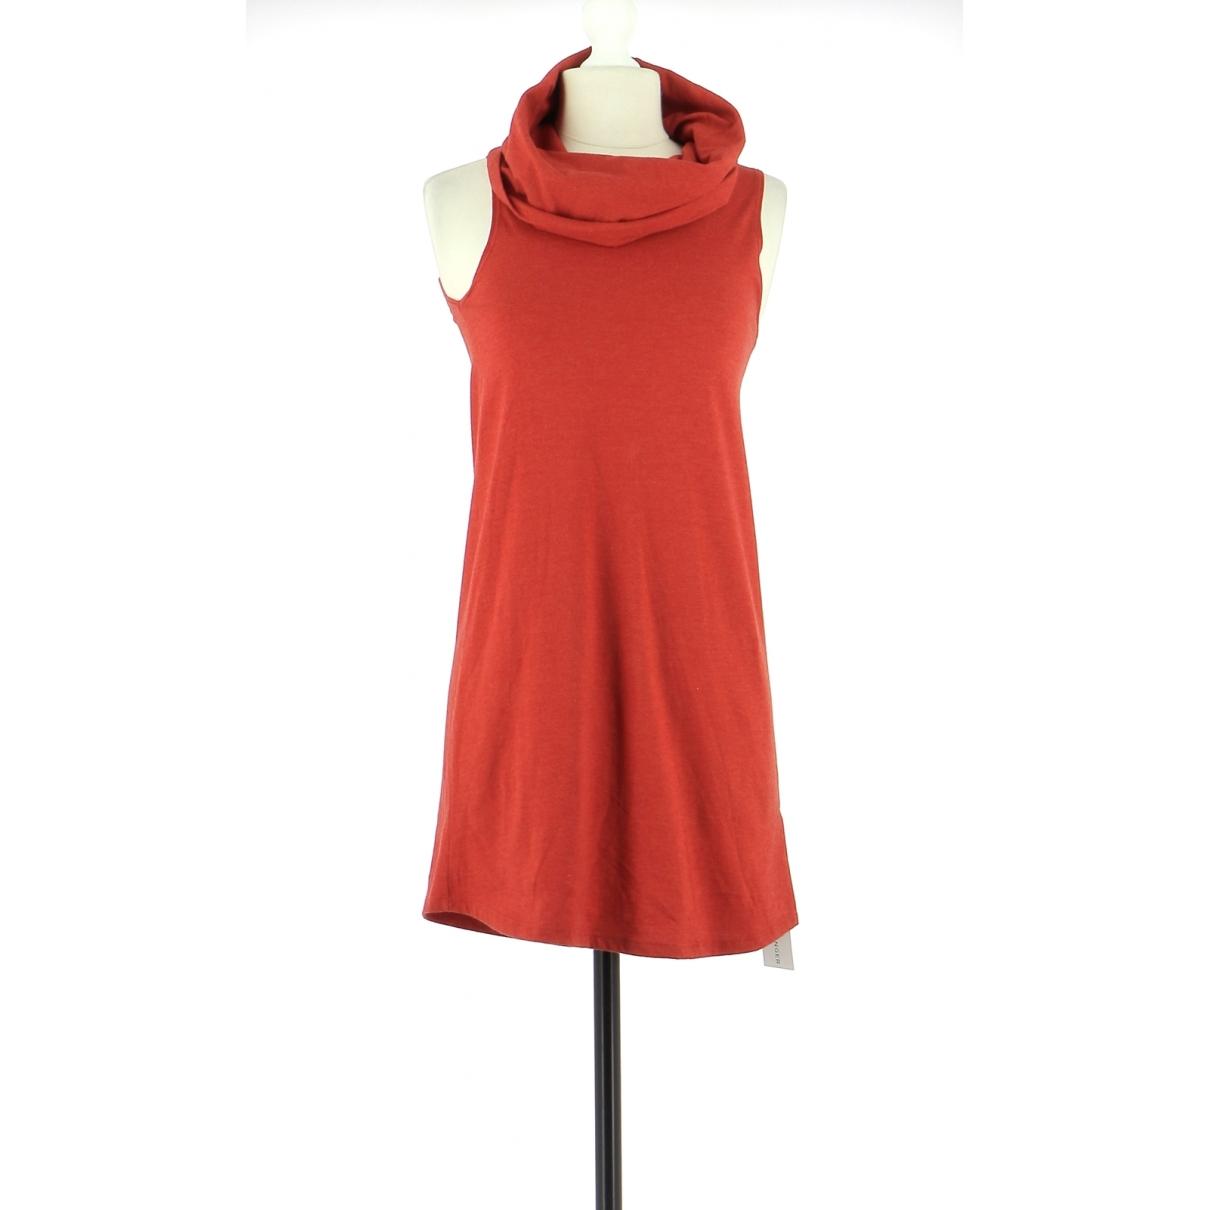 American Apparel - Robe   pour femme en coton - orange